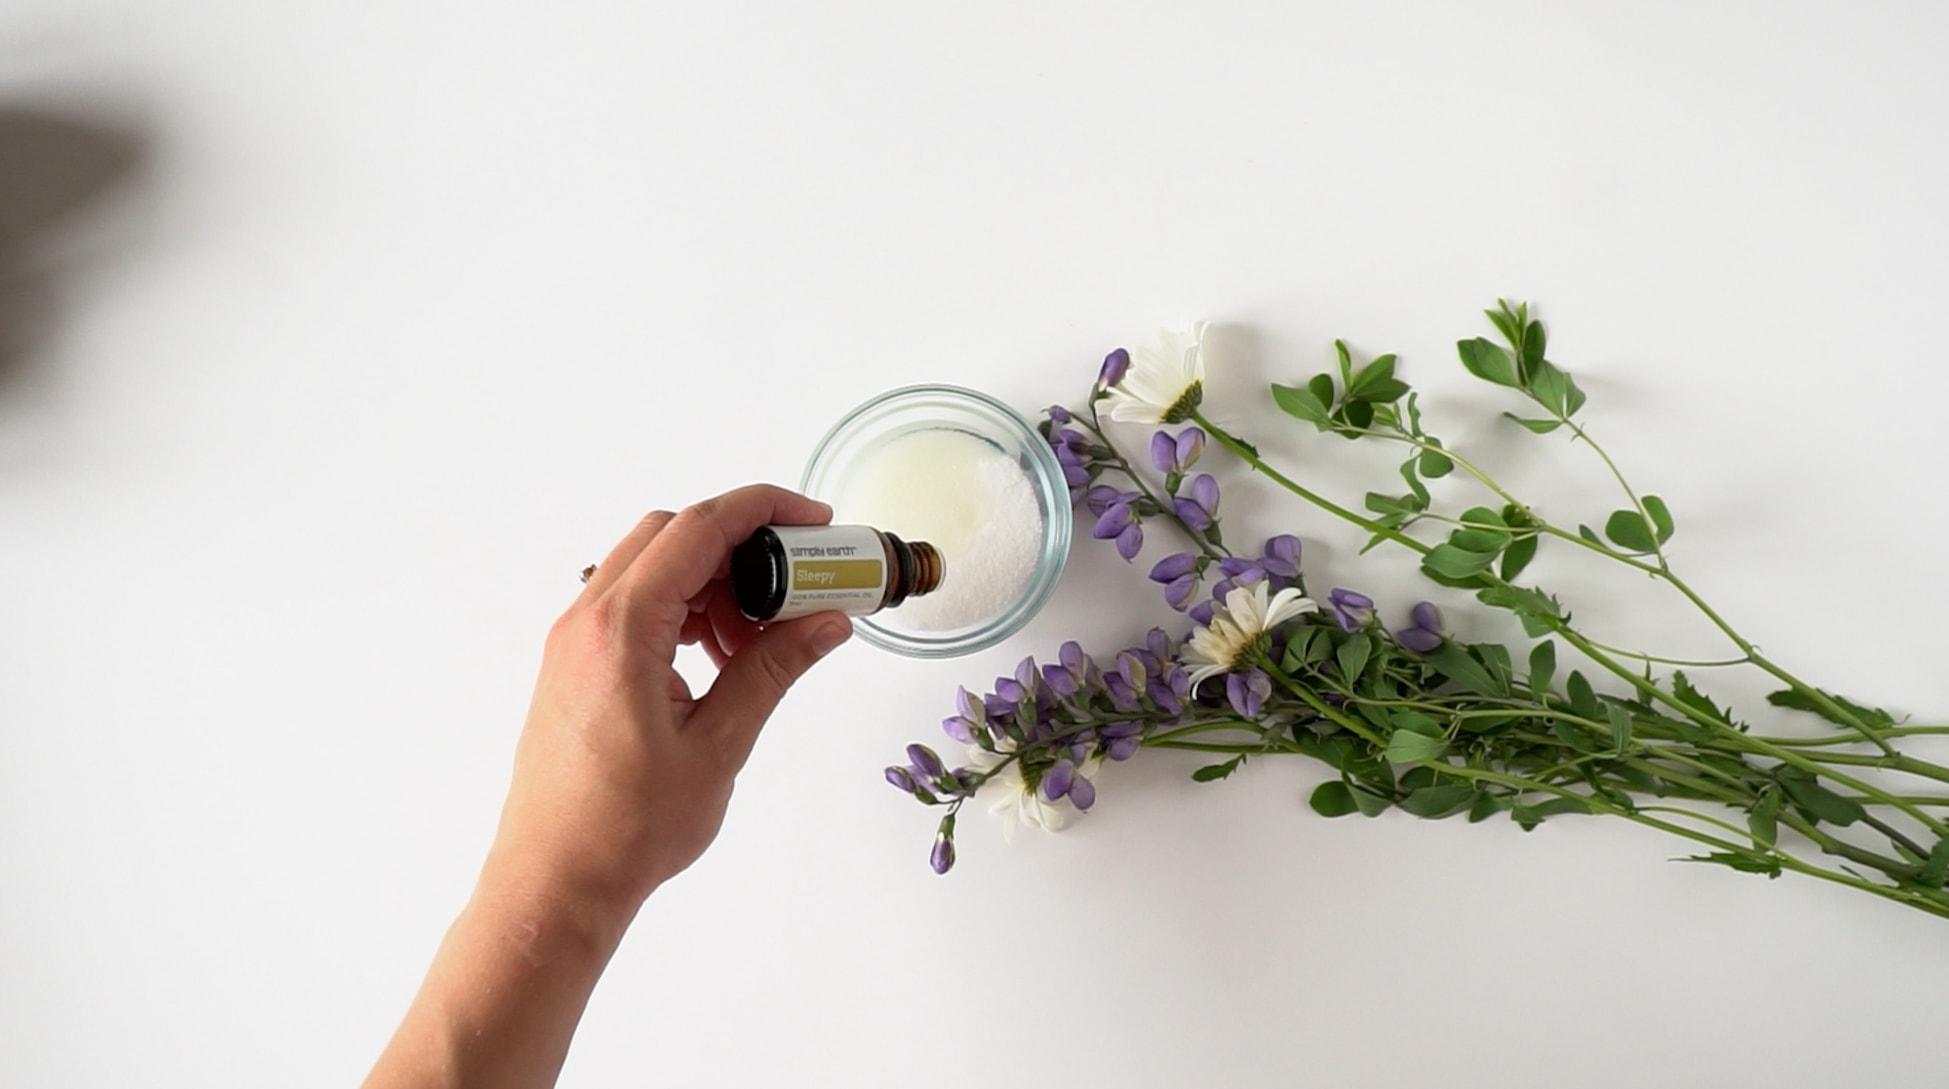 Homemade Foot Scrub Essential Oil, Essential Oil, Essential Oil Recipe, Eucalyptus Essential Oil, Sleepy Essential Oil, Blend Almond Oil